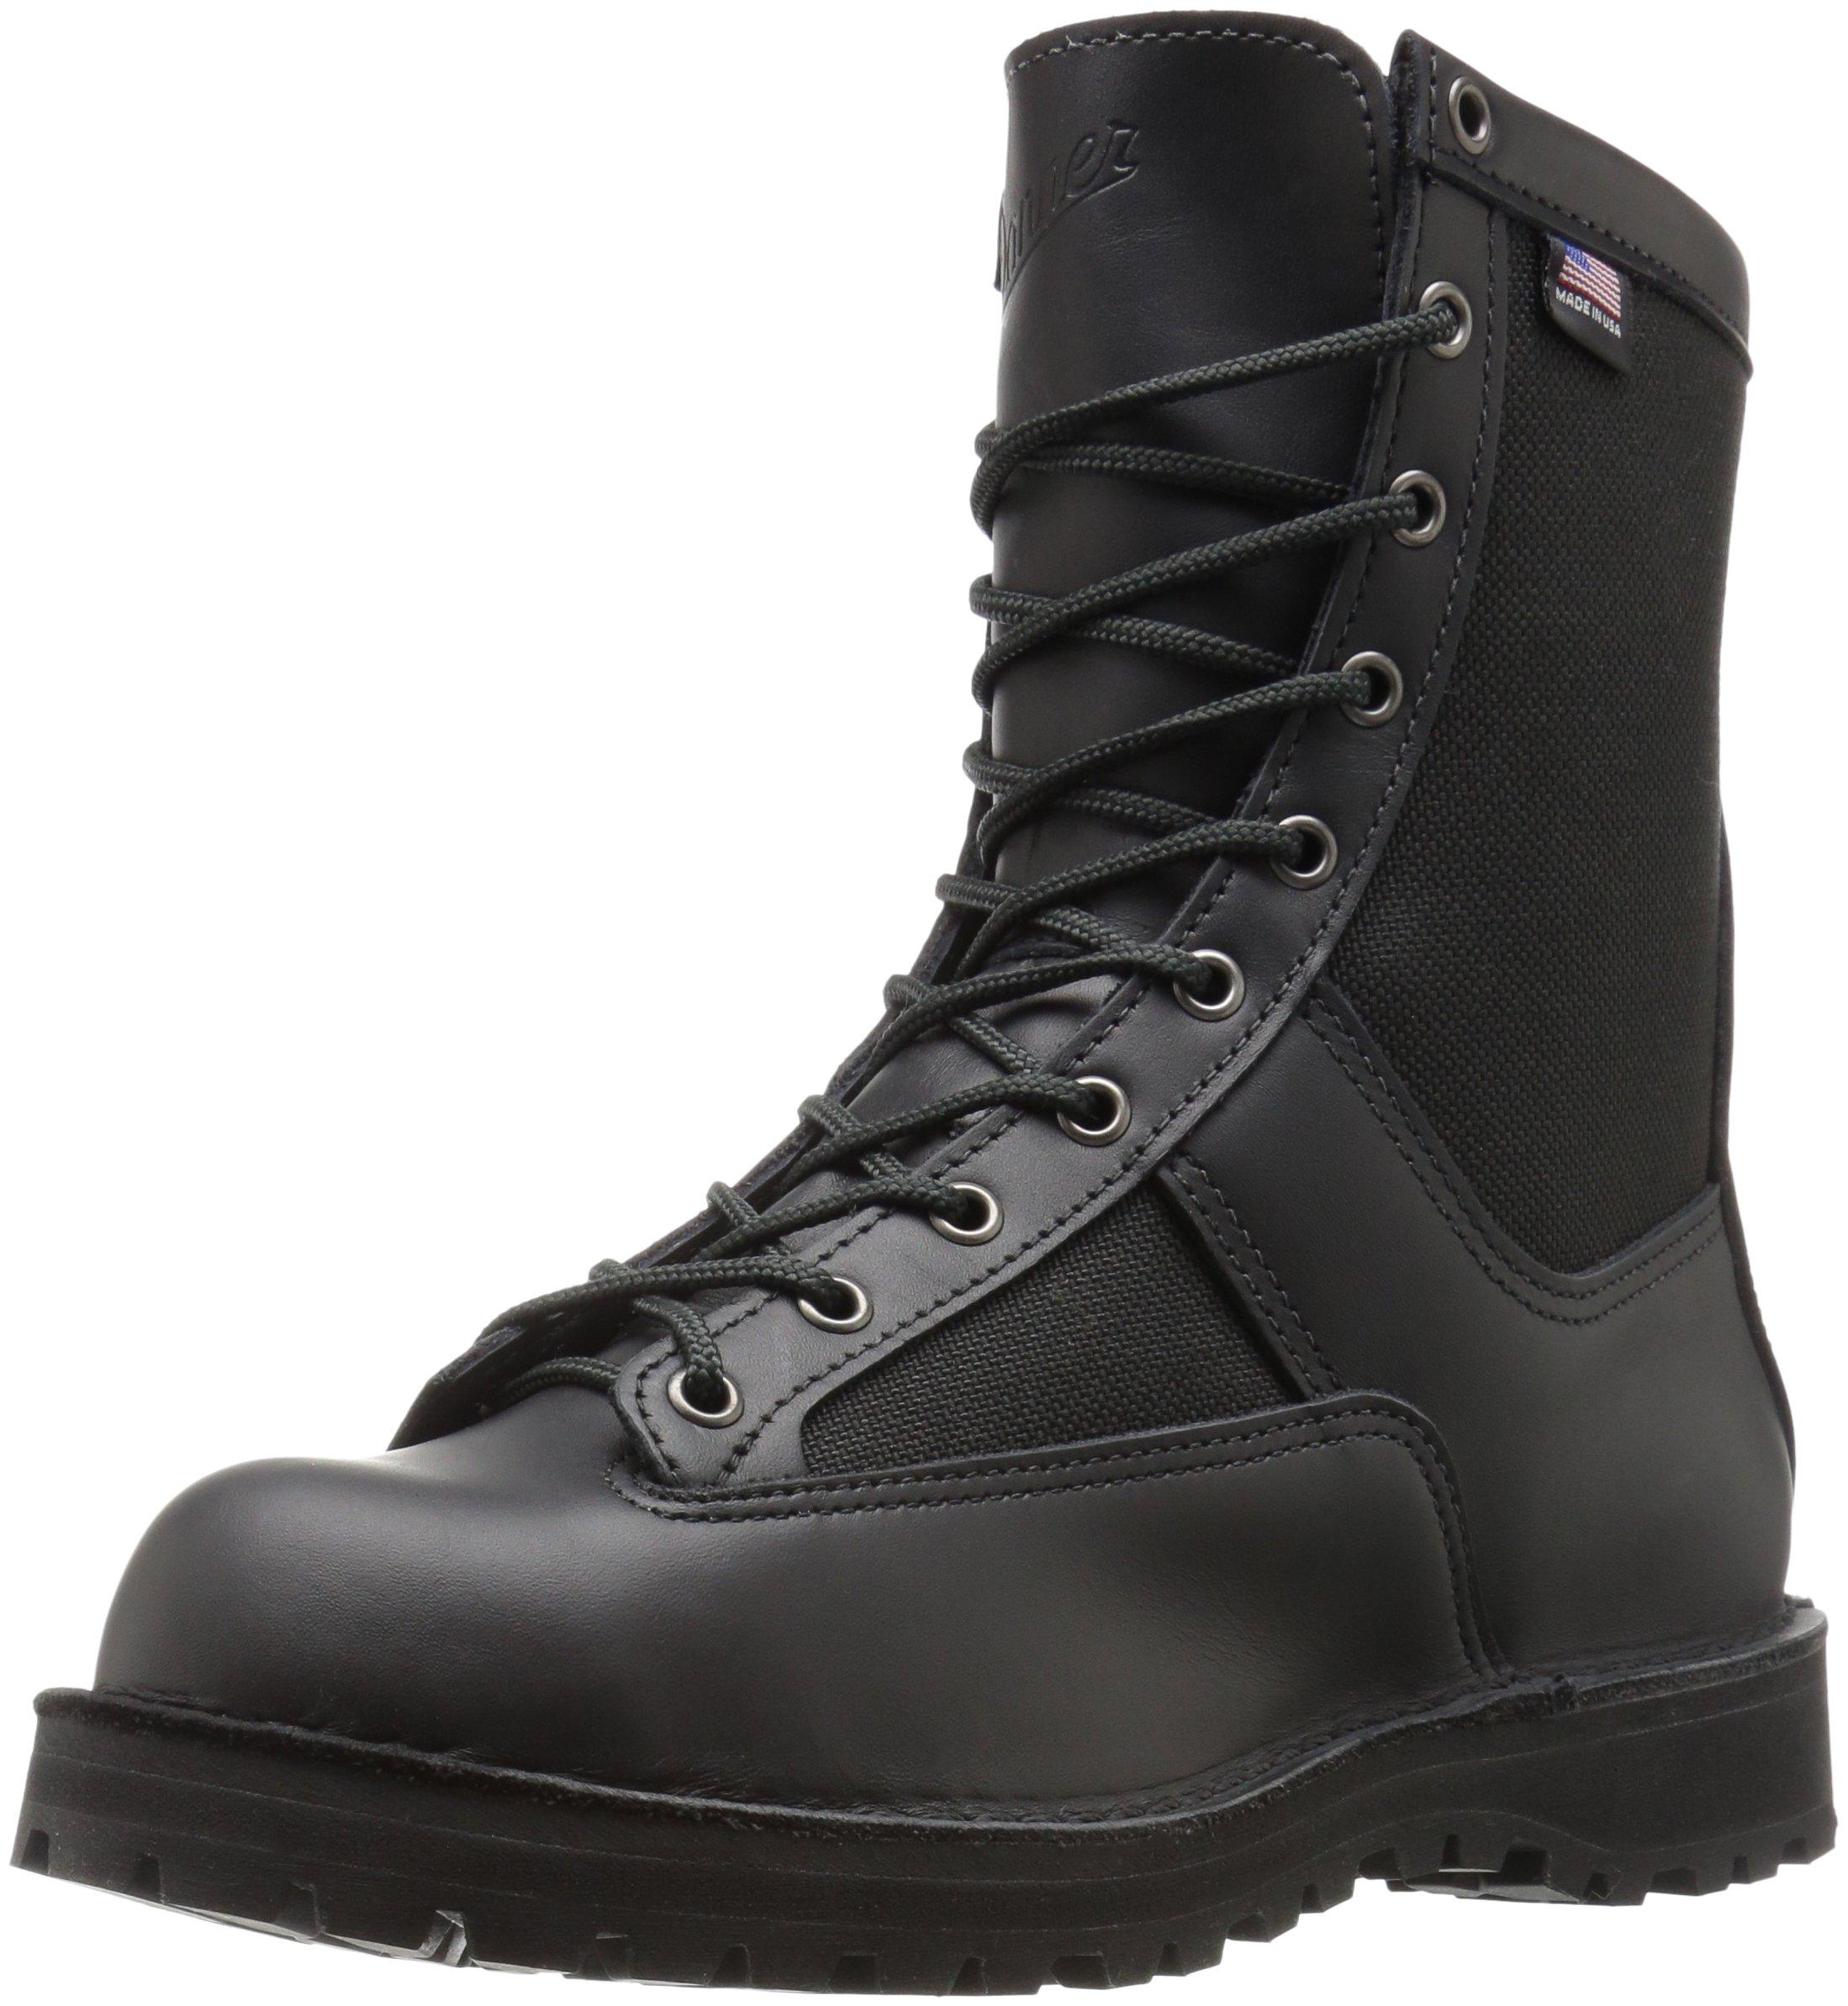 Danner Men's Acadia 8'' Black Military & Tactical Boot, 15 2E US